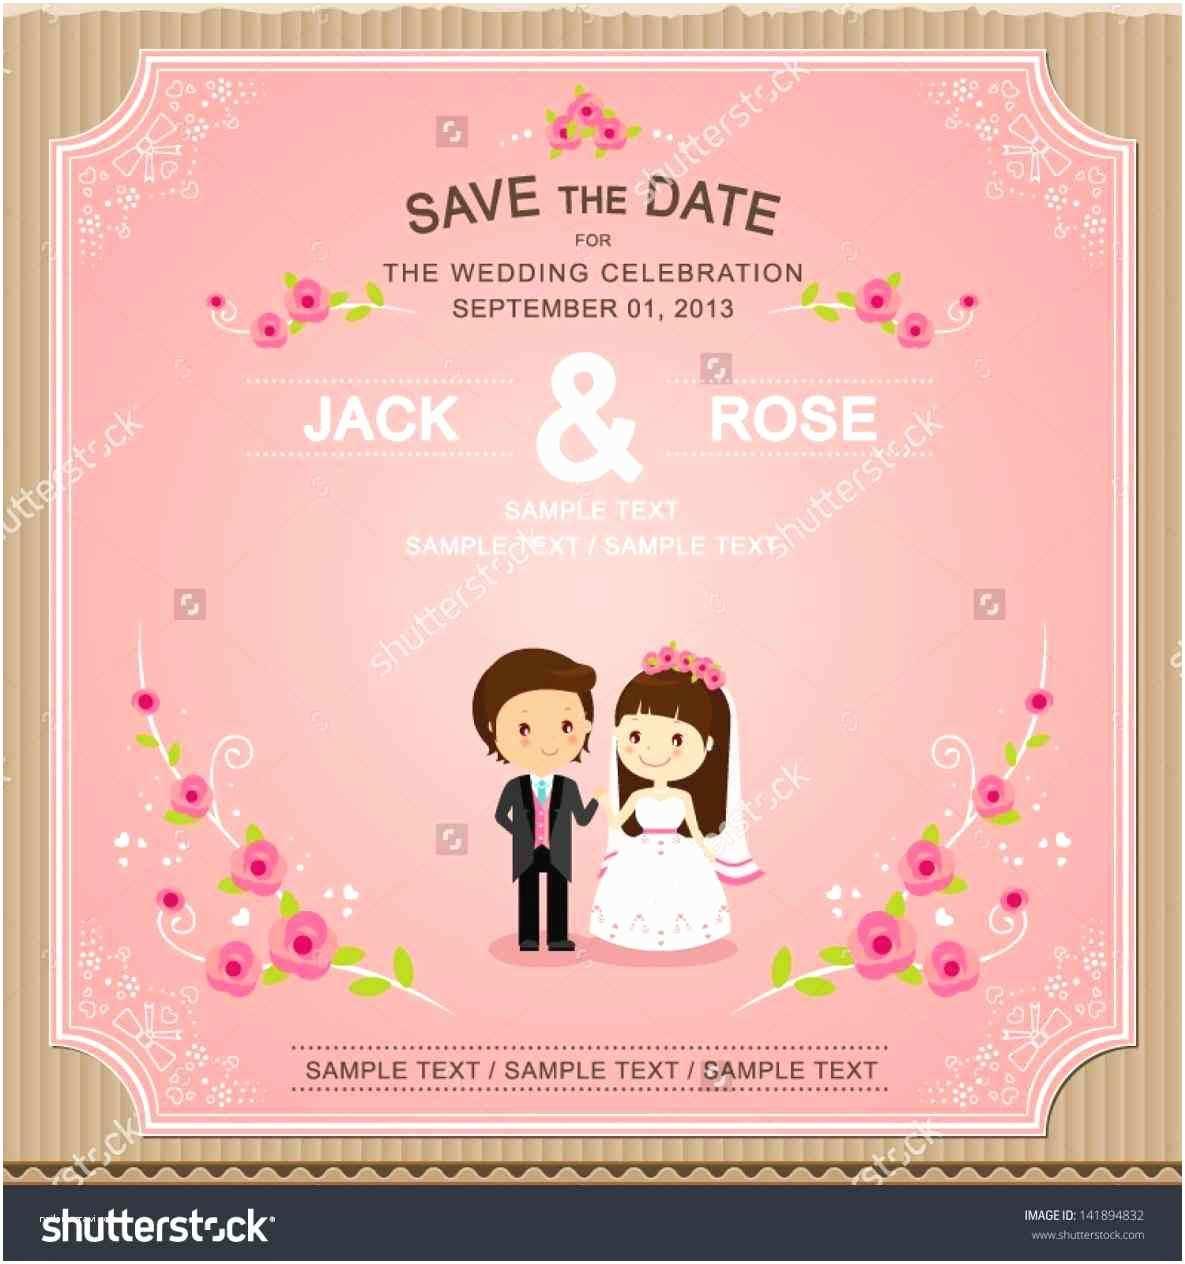 Online Editable Wedding Invitation Cards  Download Create Line Editable Wedding Invitation Cards